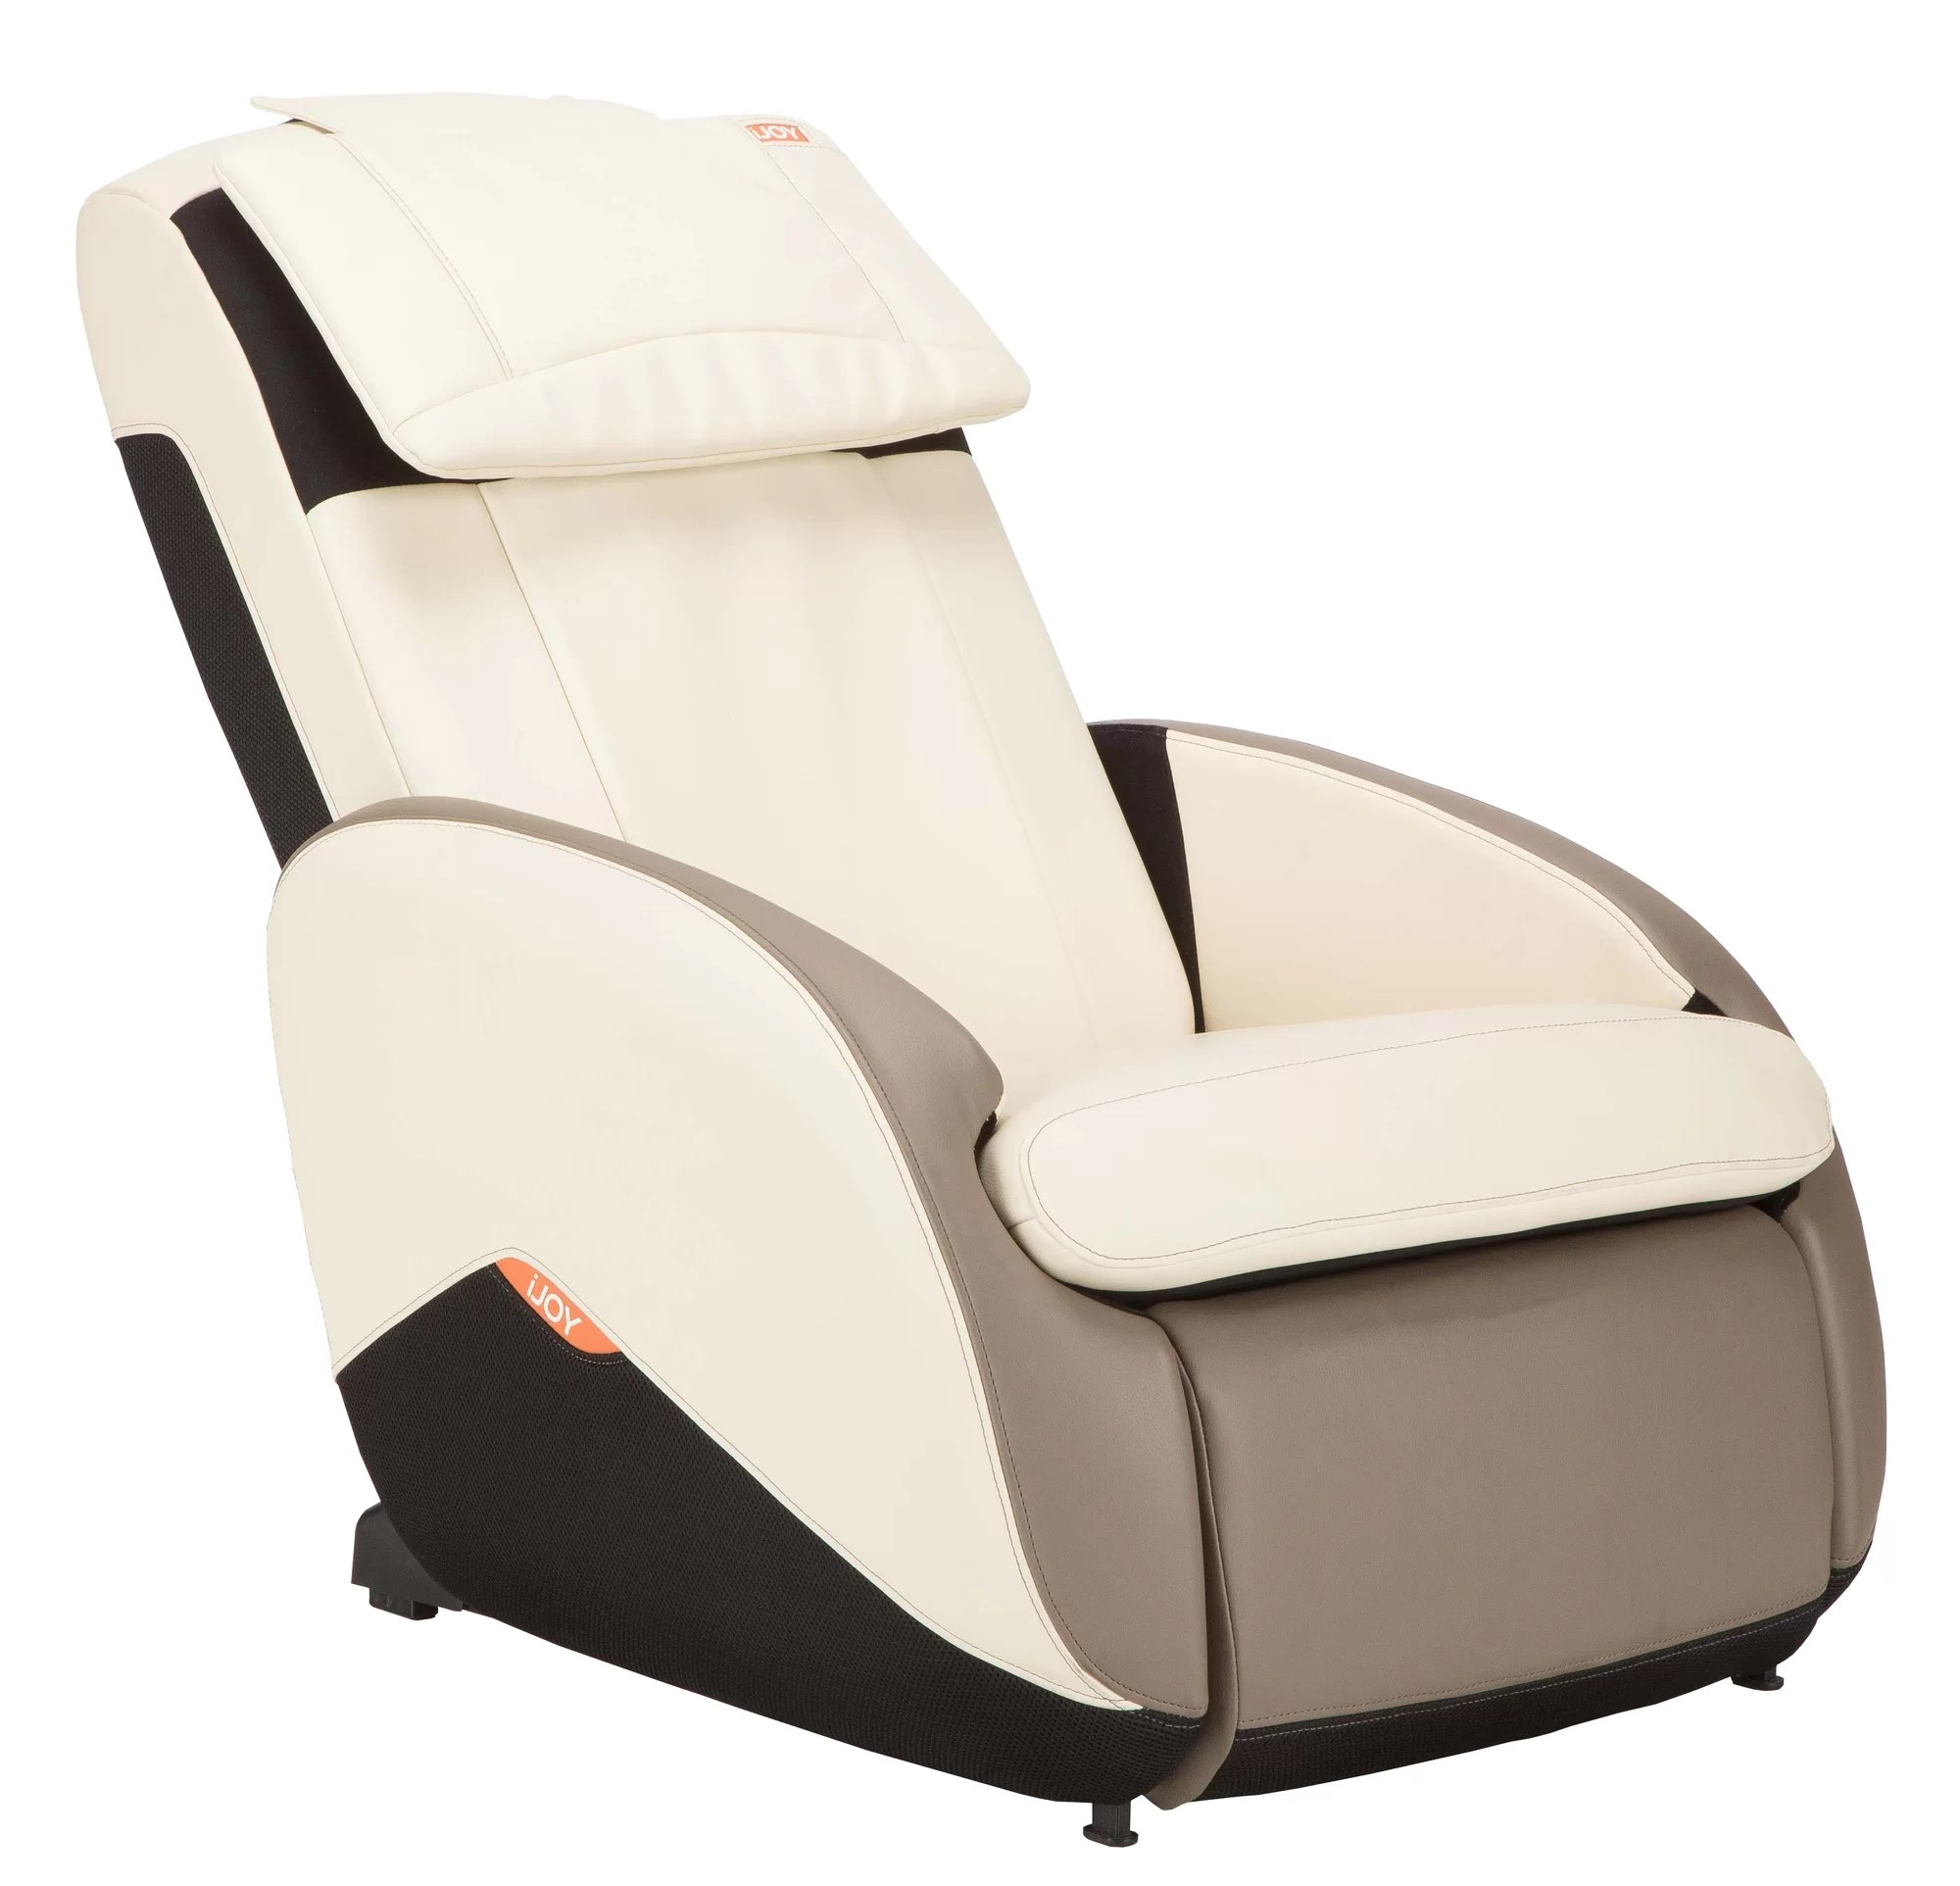 Human Touch iJoy Active 2 Zero Gravity Massage Chair  eBay